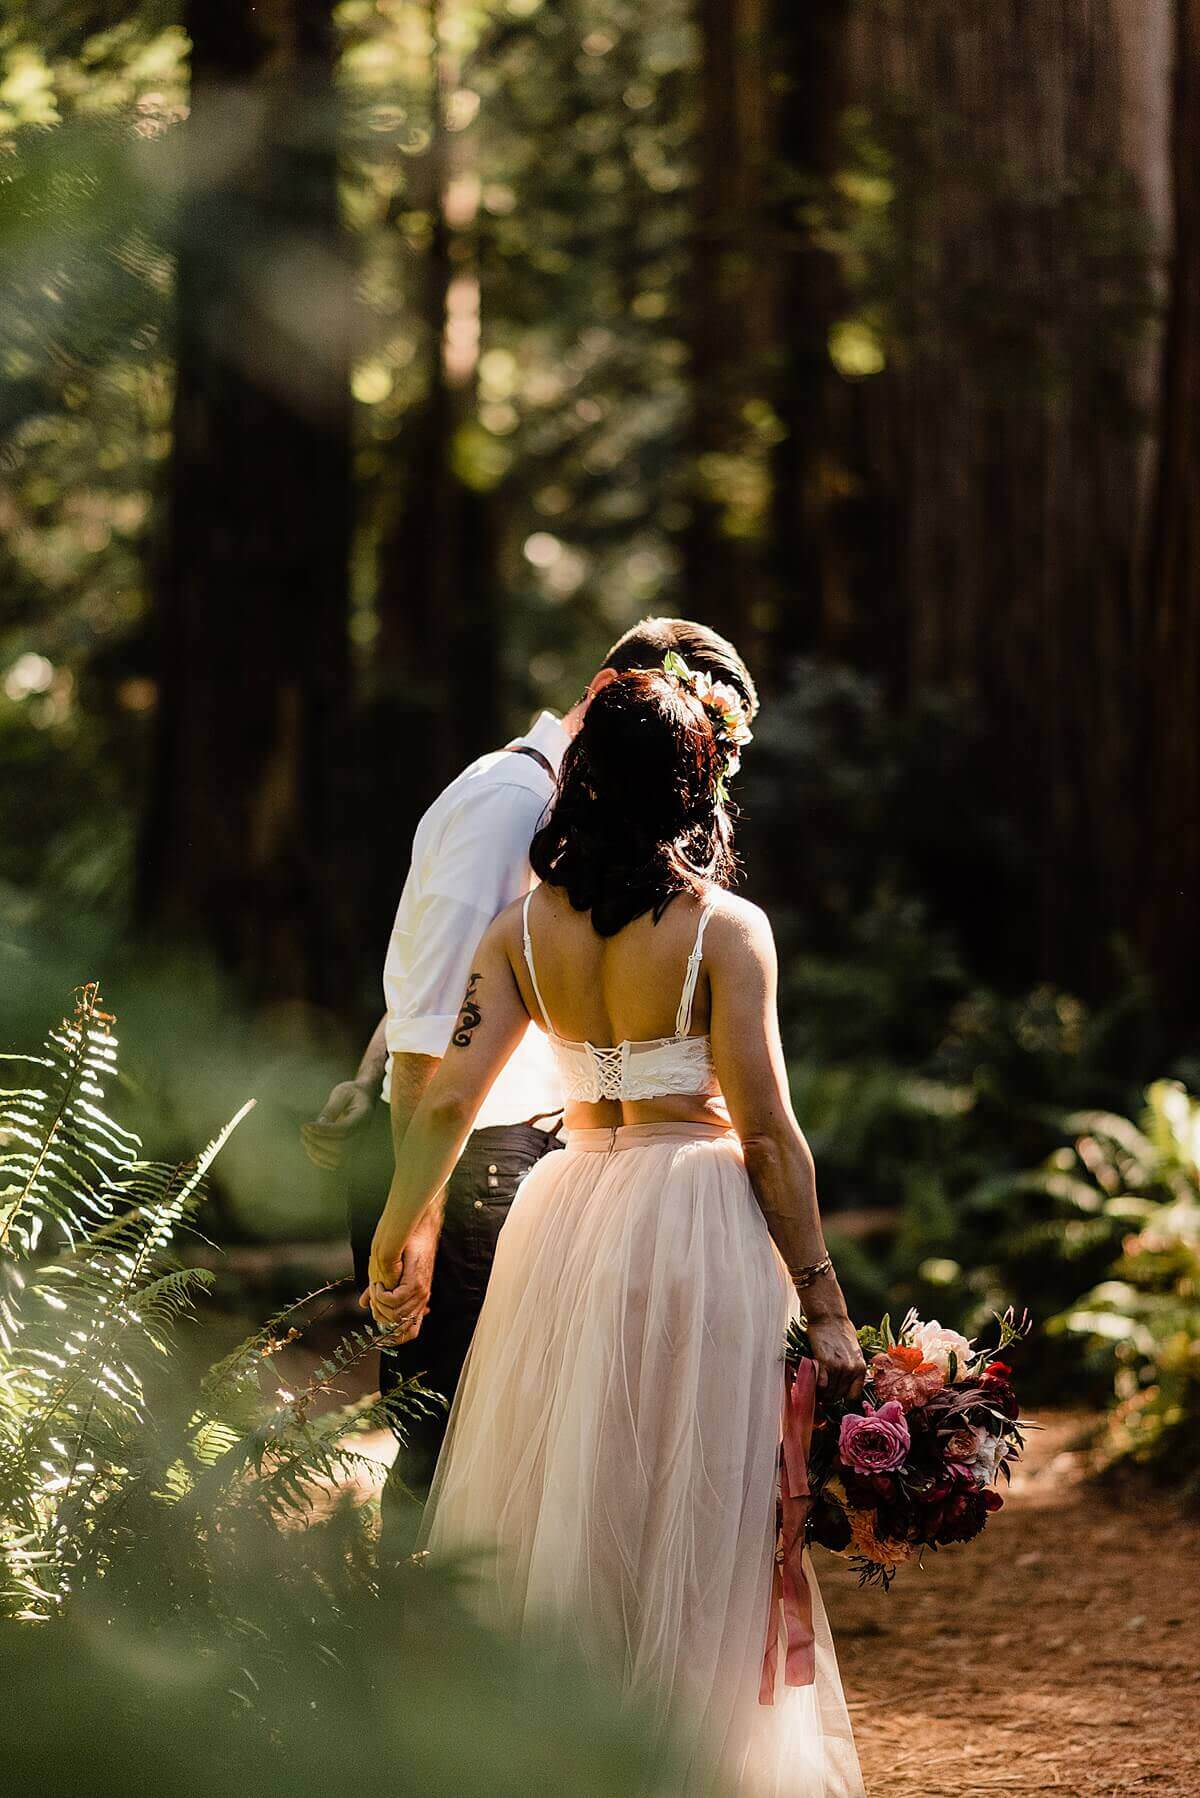 Allison-Brooks-Jedediah-Smiith-Redwoods-Adventure-Elopement-Wedding-S-Photography-Blog_0050.jpg